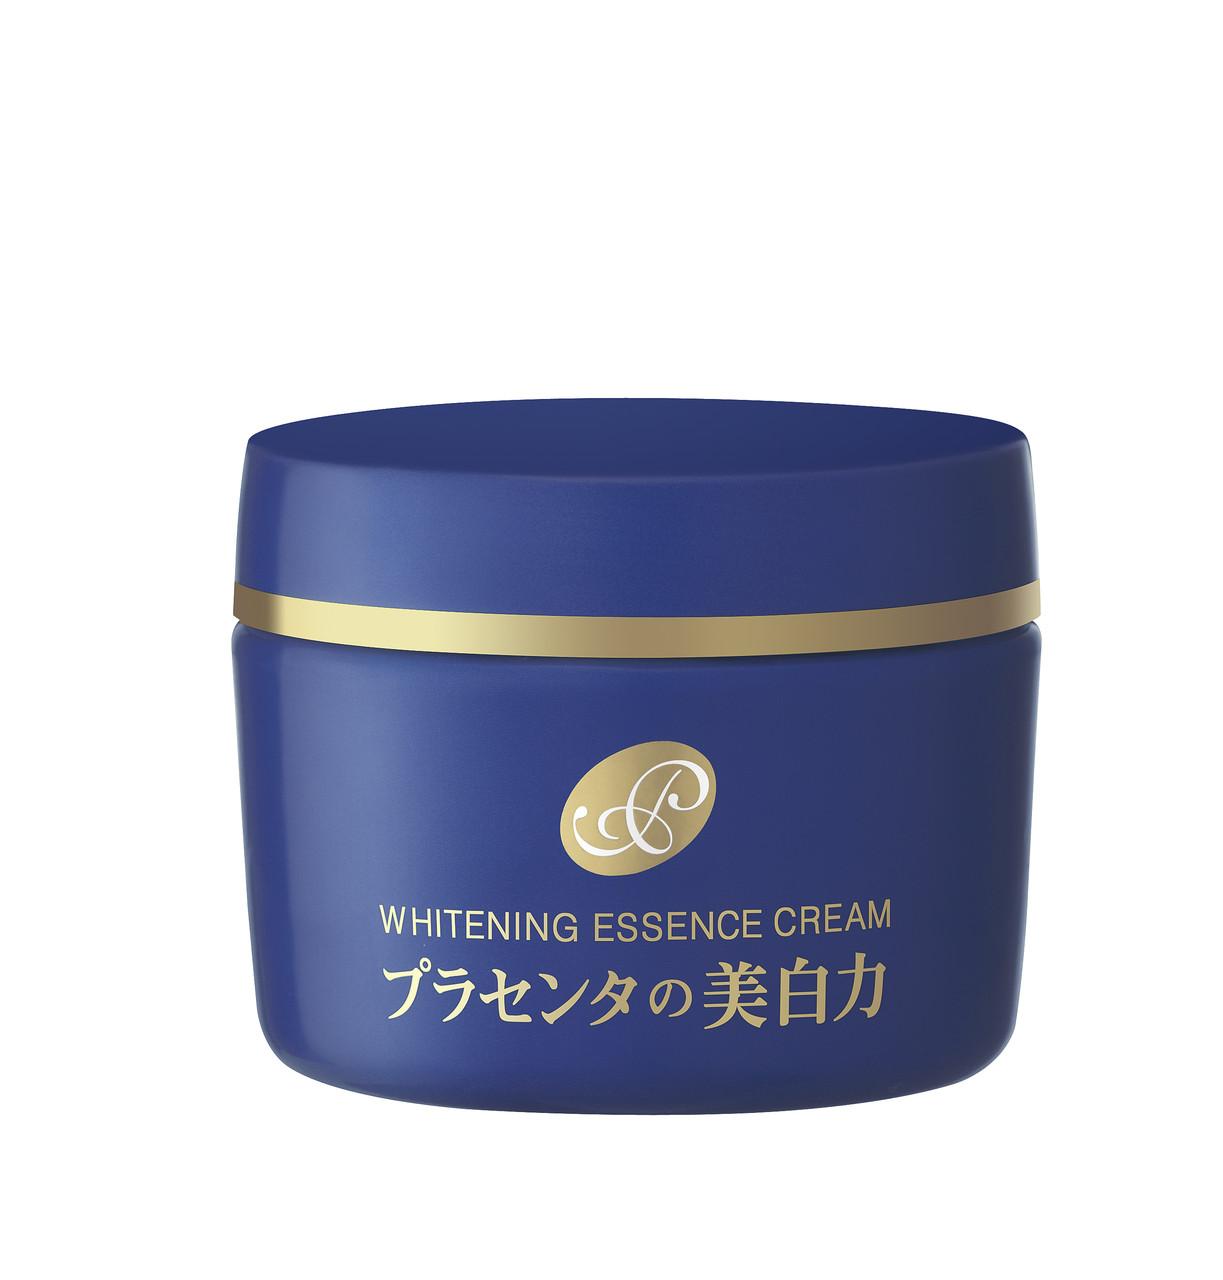 Крем-есенція Meishoku Placenta Essence Cream з екстрактом плаценти і відбілюючим ефектом, 55 г